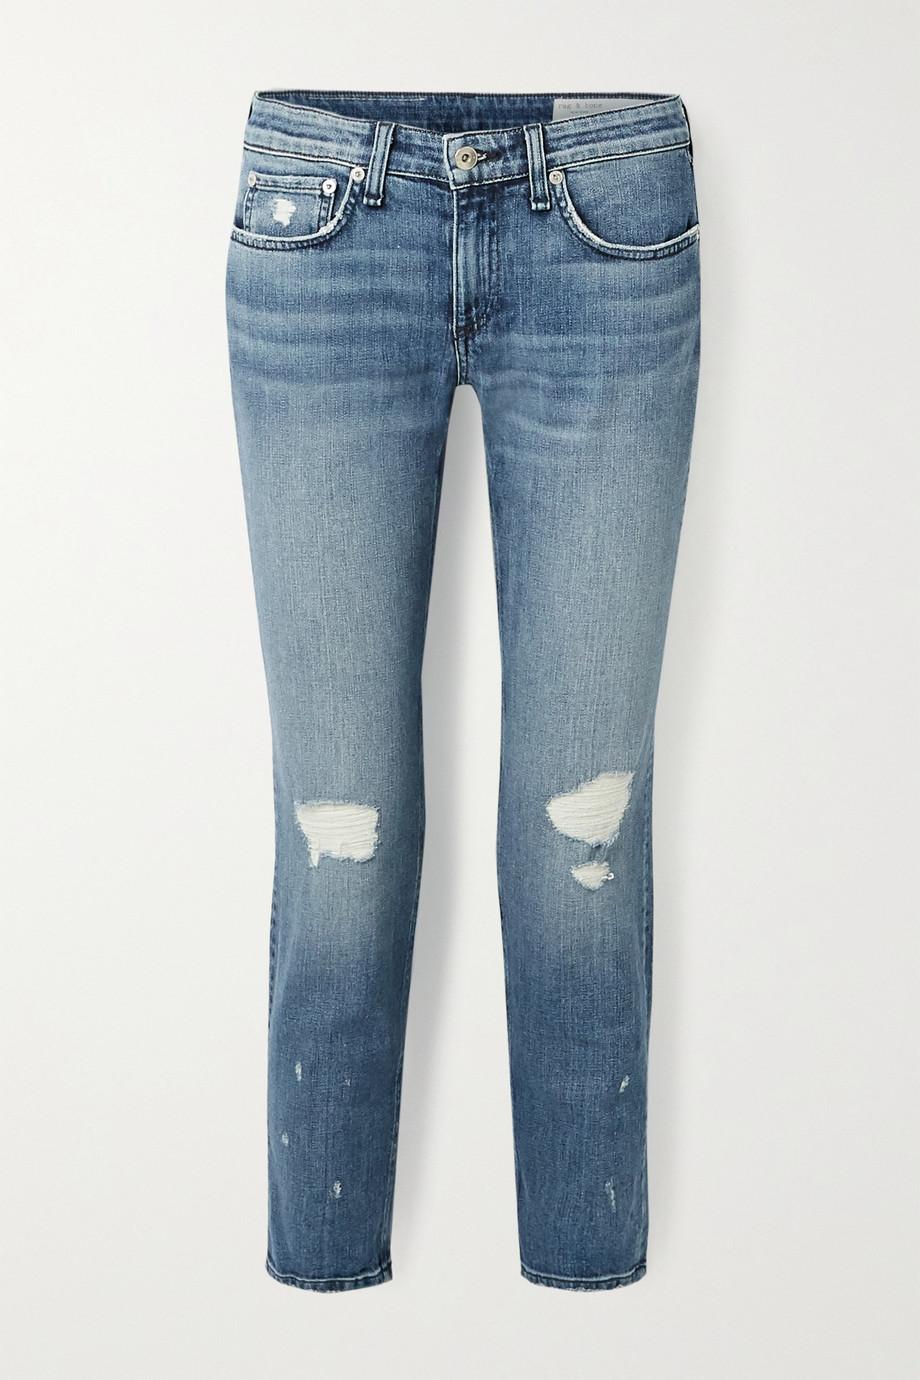 rag & bone Dre cropped low-rise slim boyfriend jeans